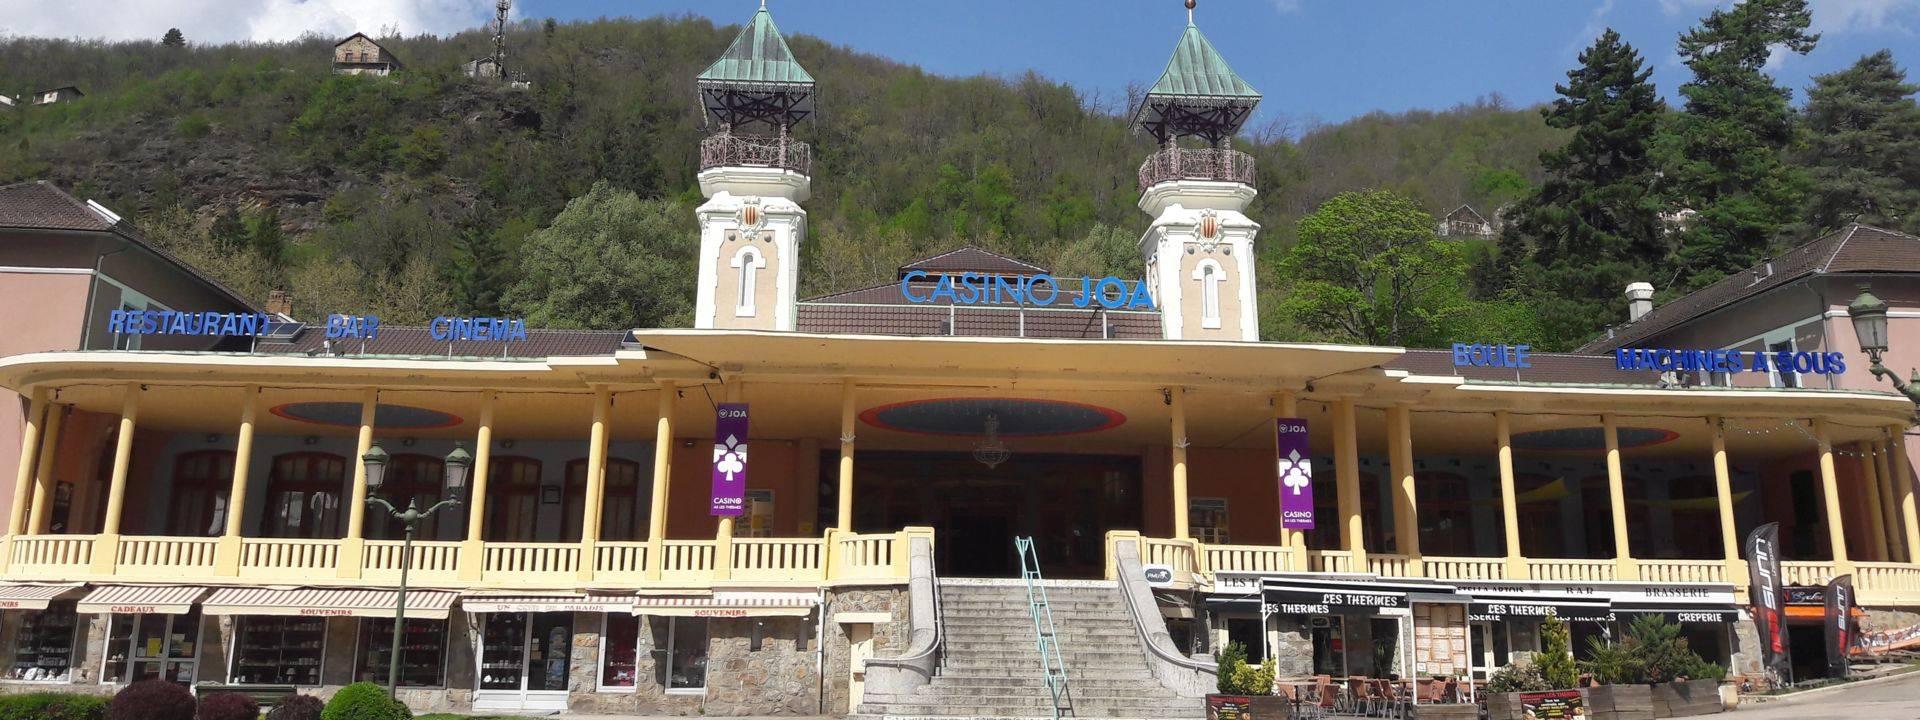 Concert casino ax les thermes borgata 3 card poker payout